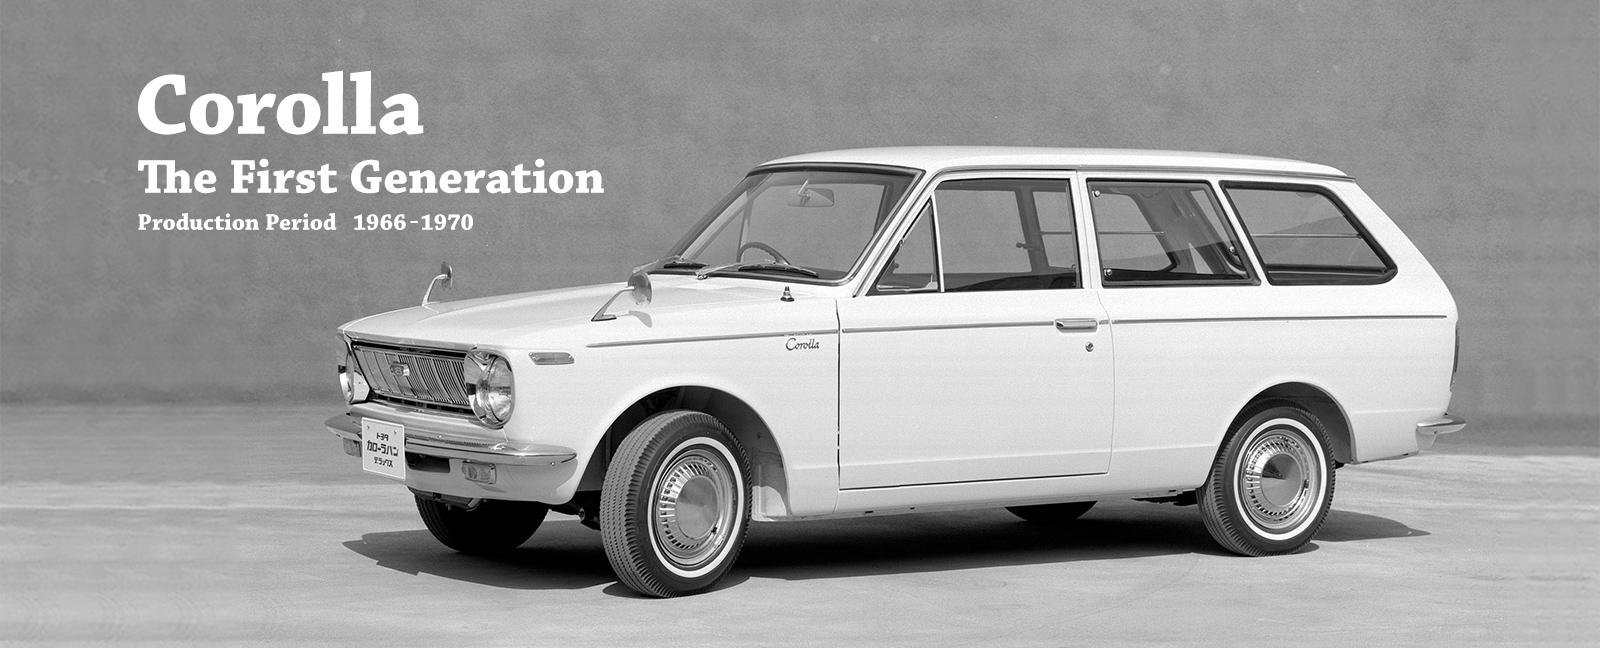 L'histoire de la Toyota Corolla en accéléré !